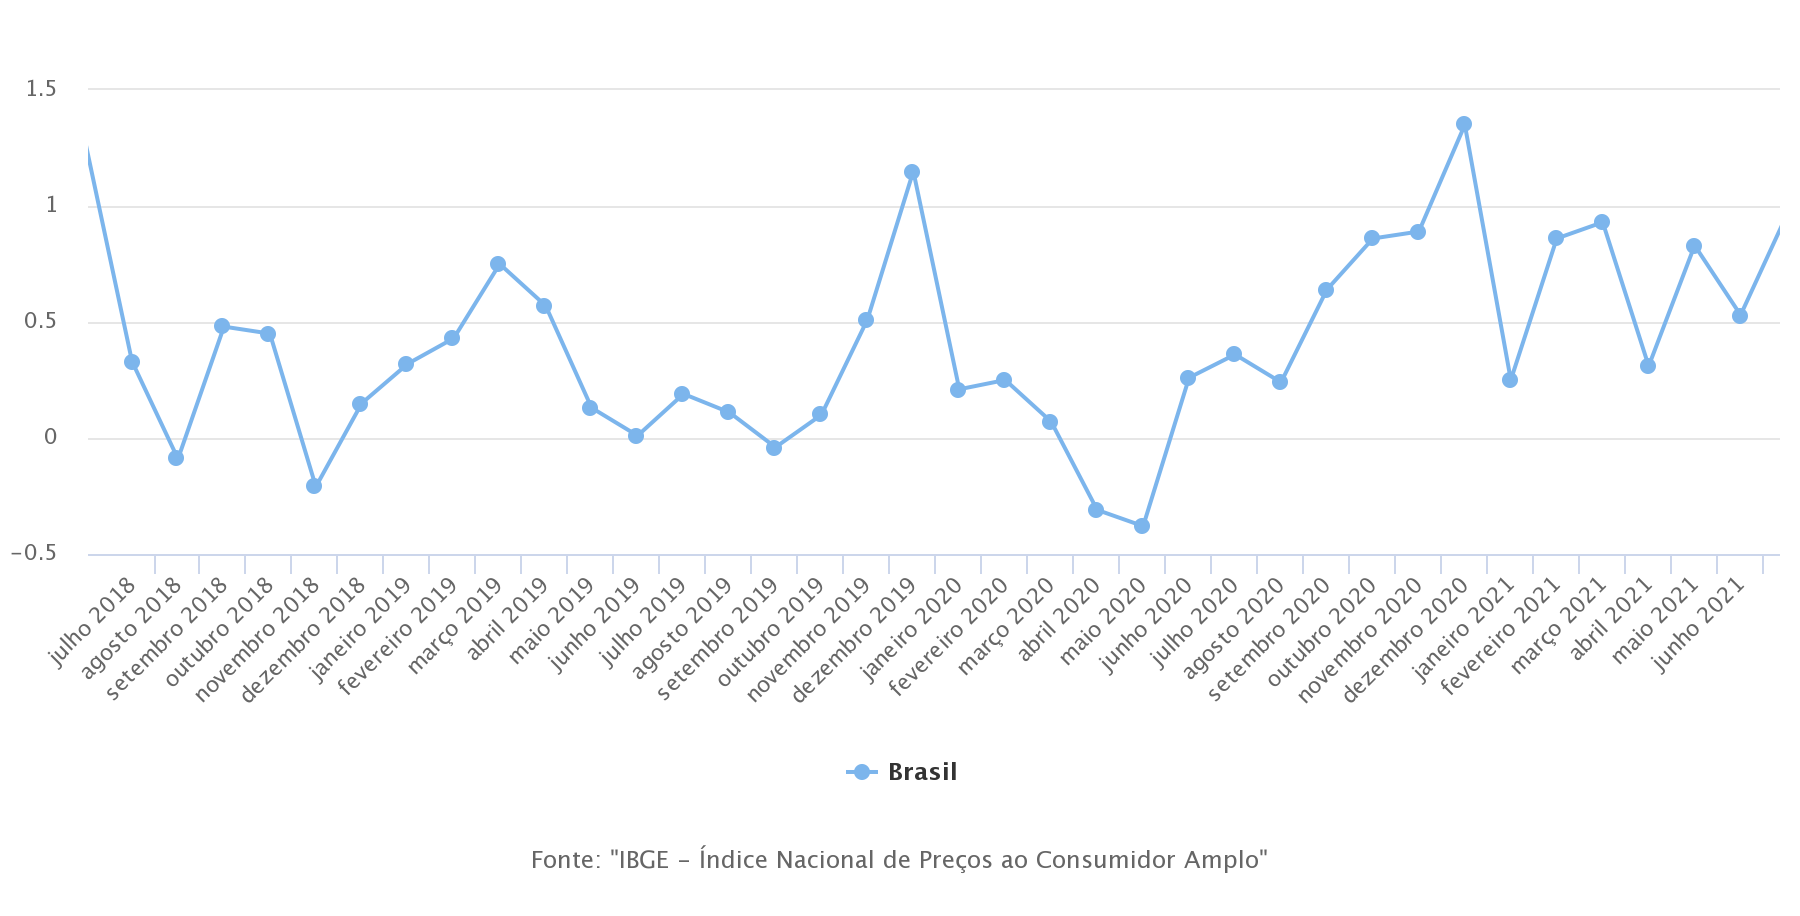 Escalada do IPCA surpreendeu negativamente o mercado - Gráfico: IBGE